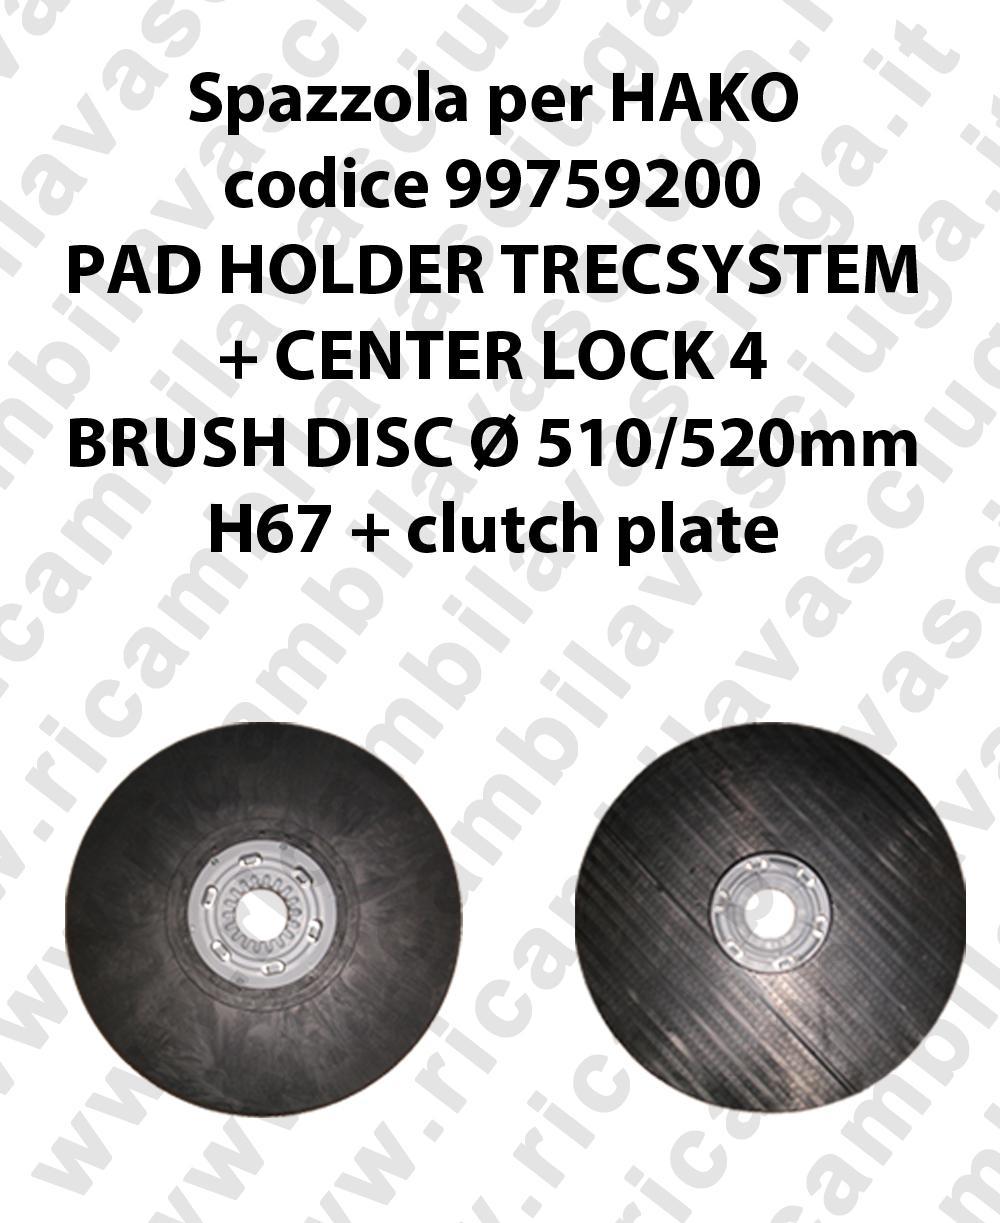 PAD HOLDER TRECSYSTEM  per lavapavimenti HAKO codice 99759200